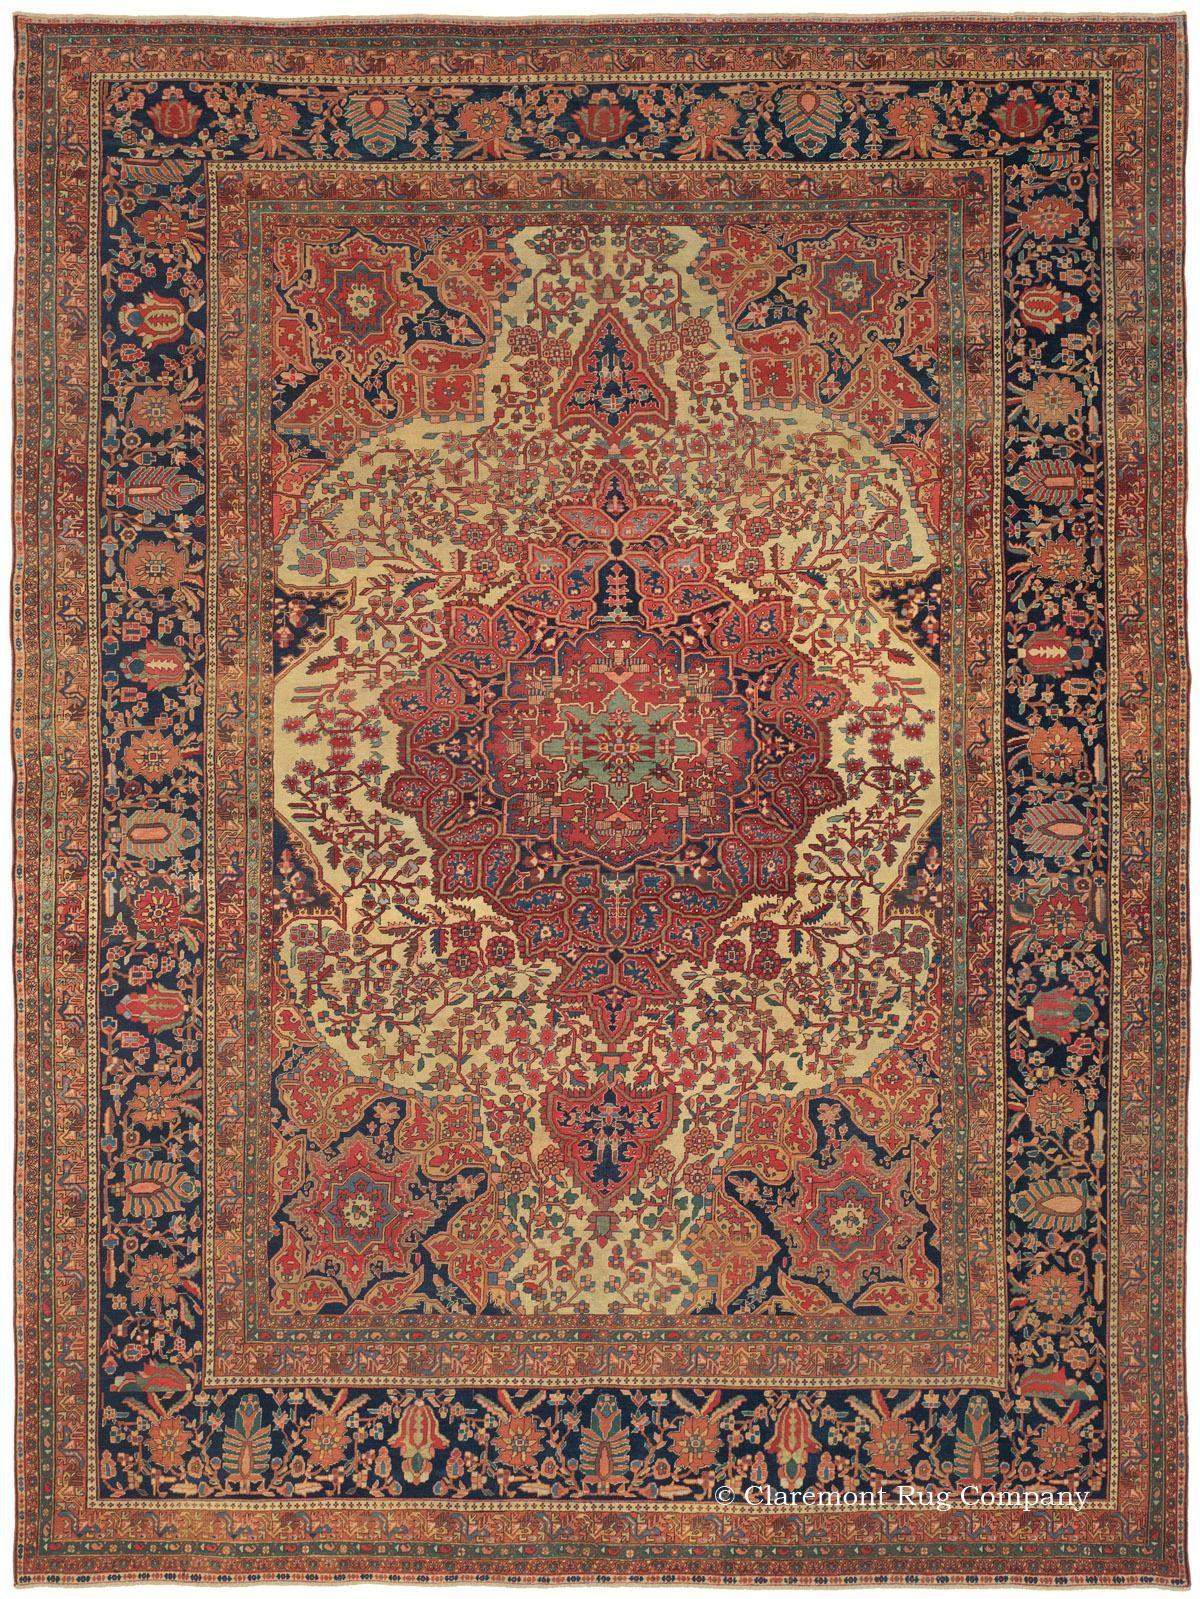 Old Ferahan Sarouk Antique Rug In Pastel Colors Rugs Antique Oriental Rugs Flying Carpet